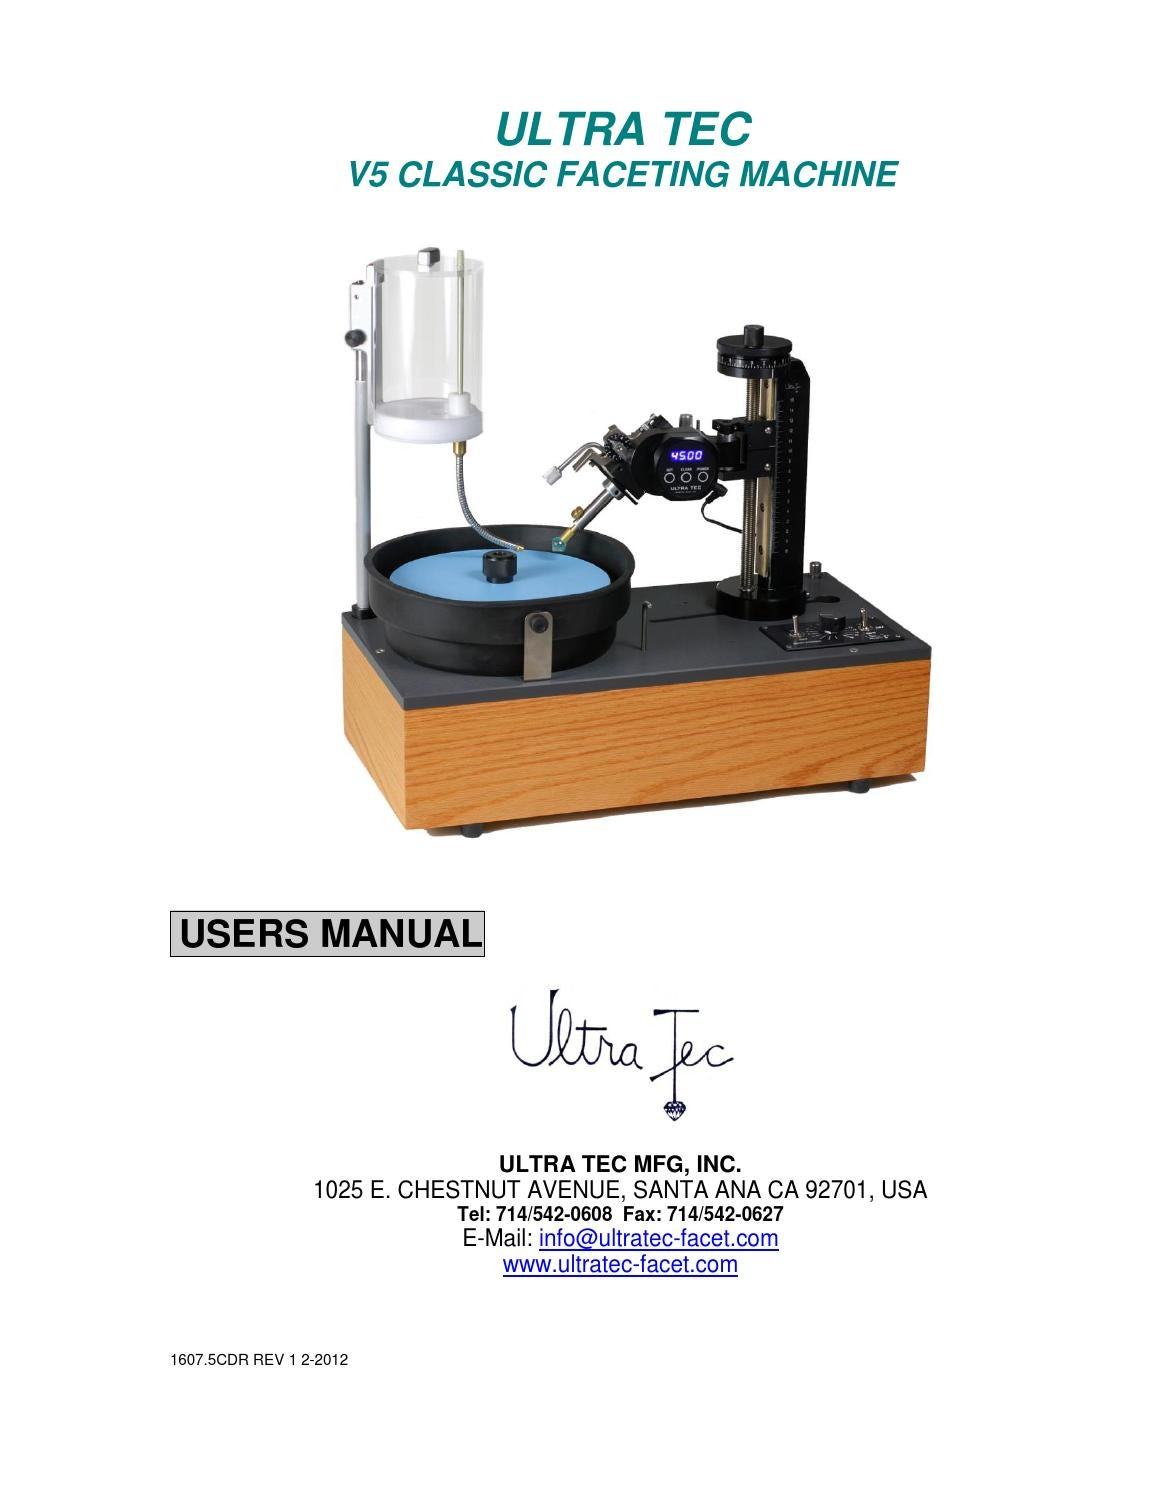 ultra tec faceting machine